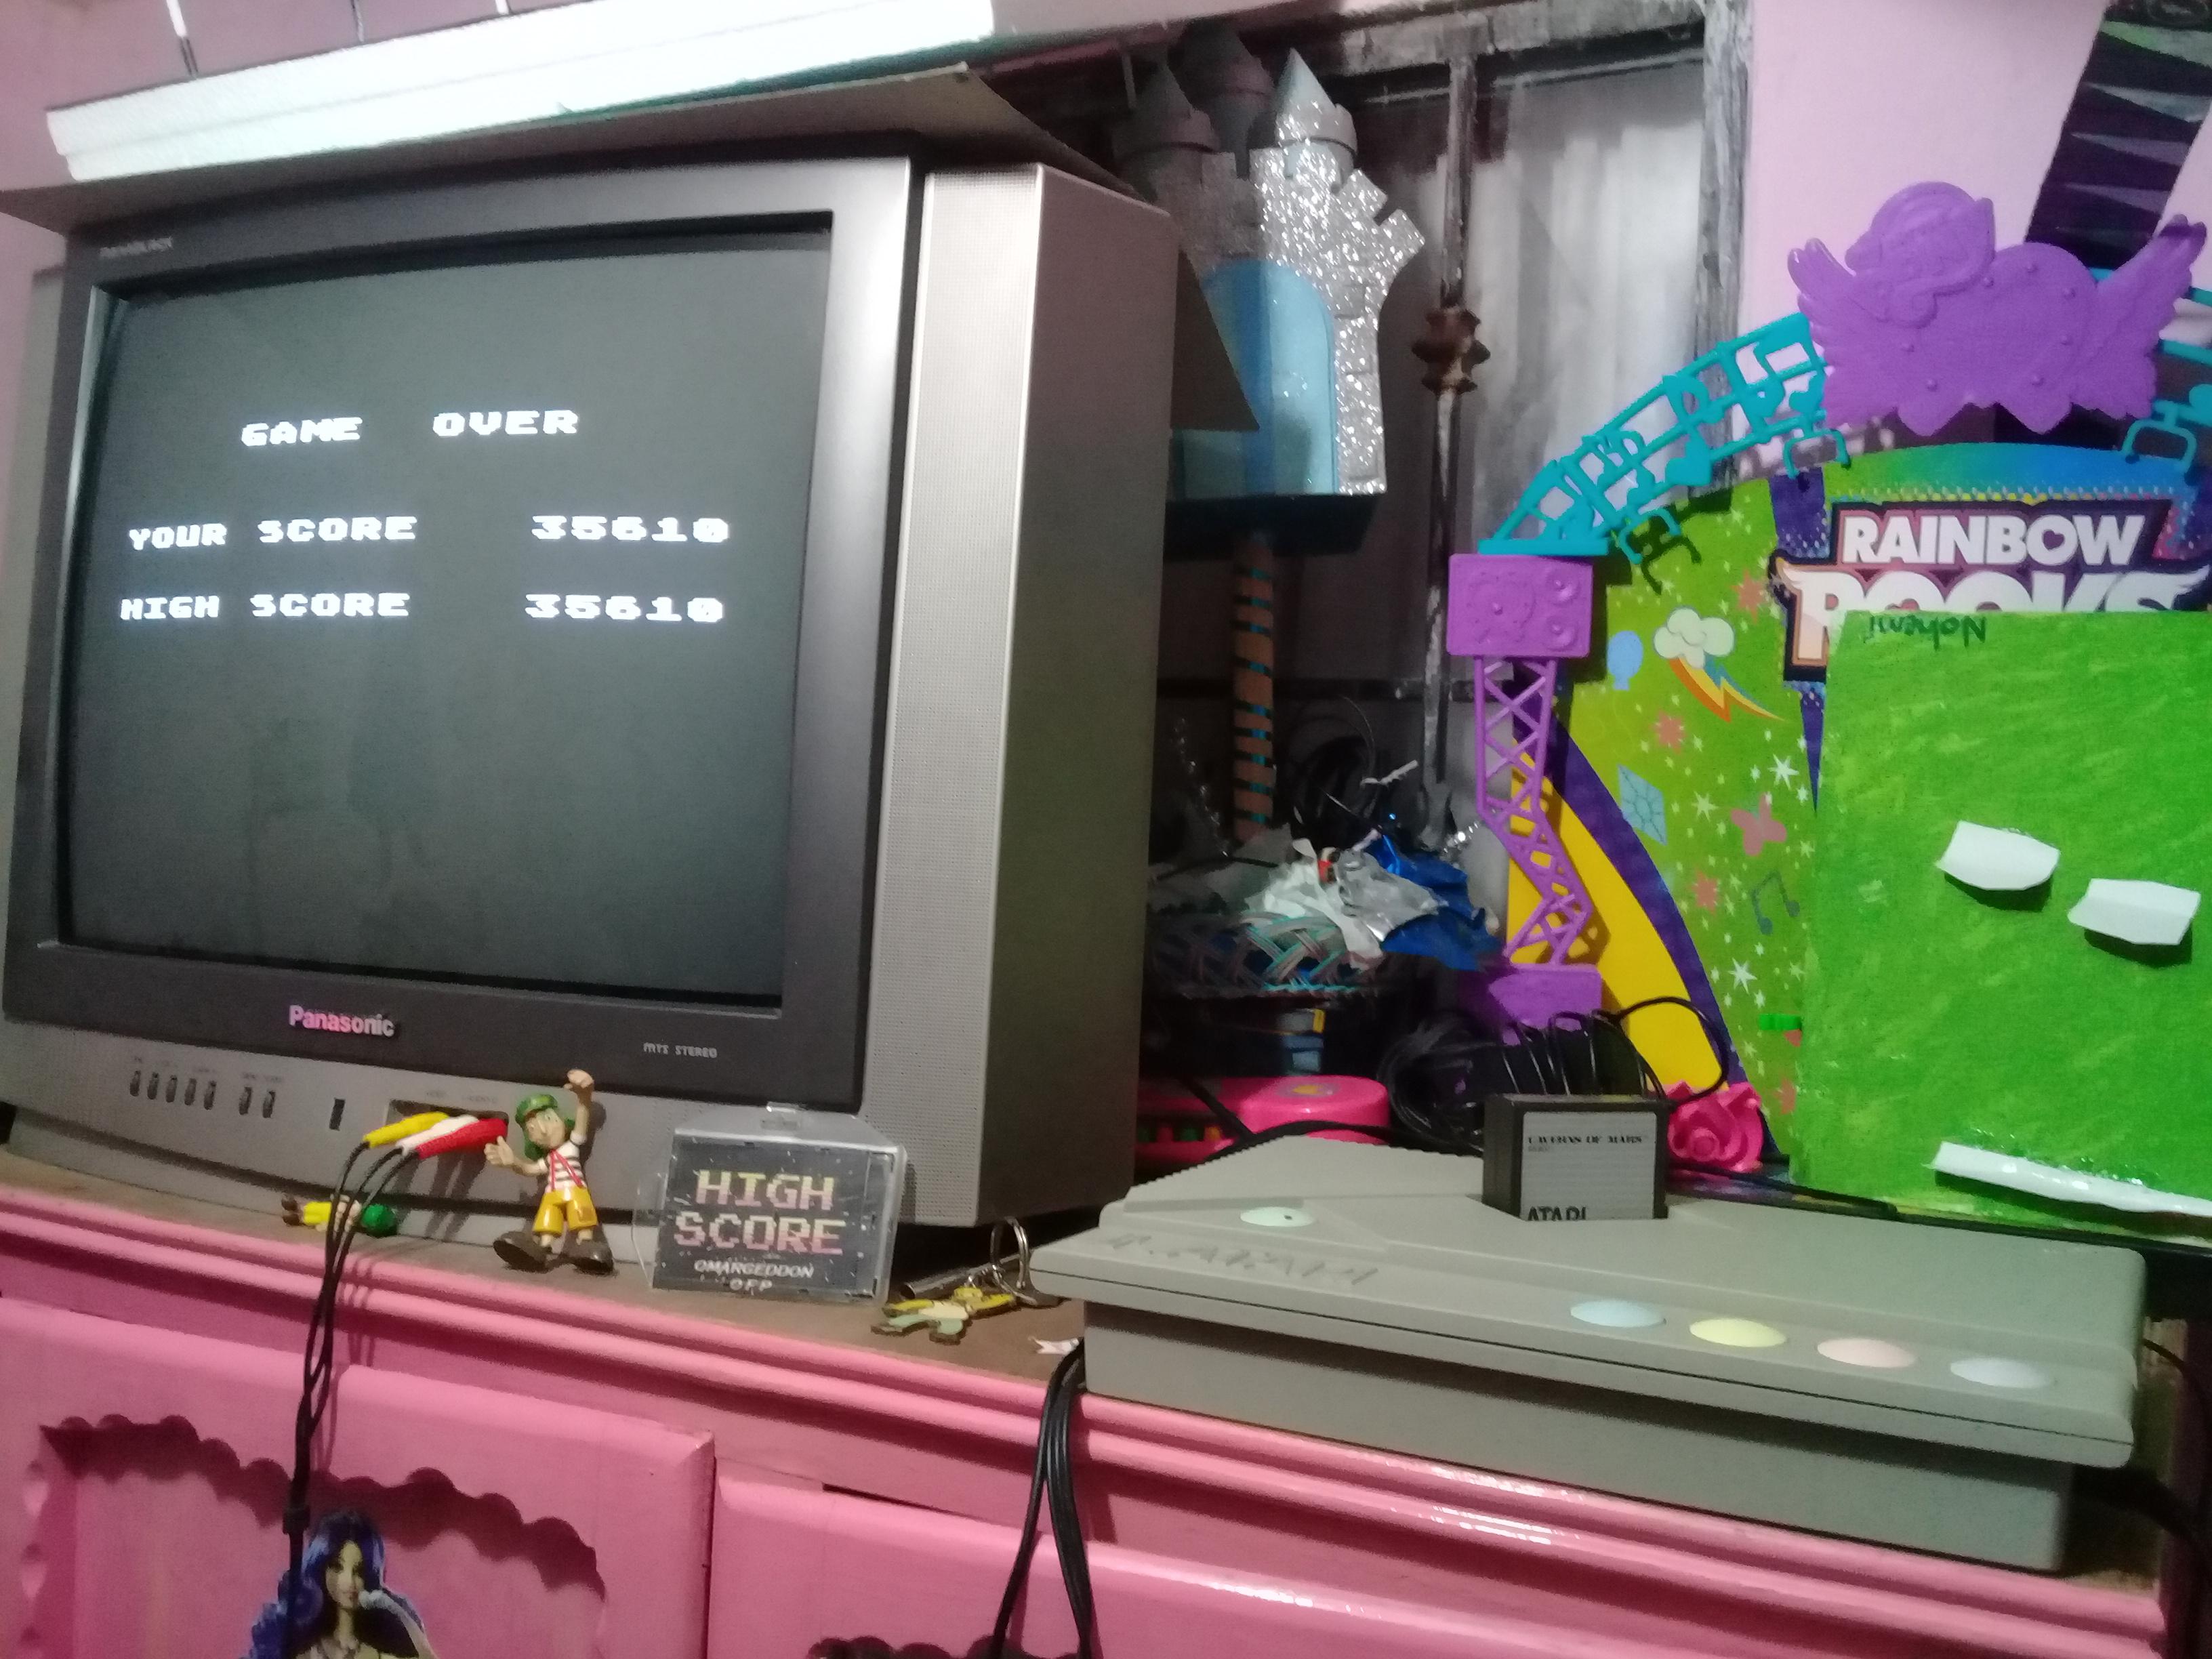 omargeddon: Caverns of Mars [Commander] (Atari 400/800/XL/XE) 35,610 points on 2019-01-08 18:43:21